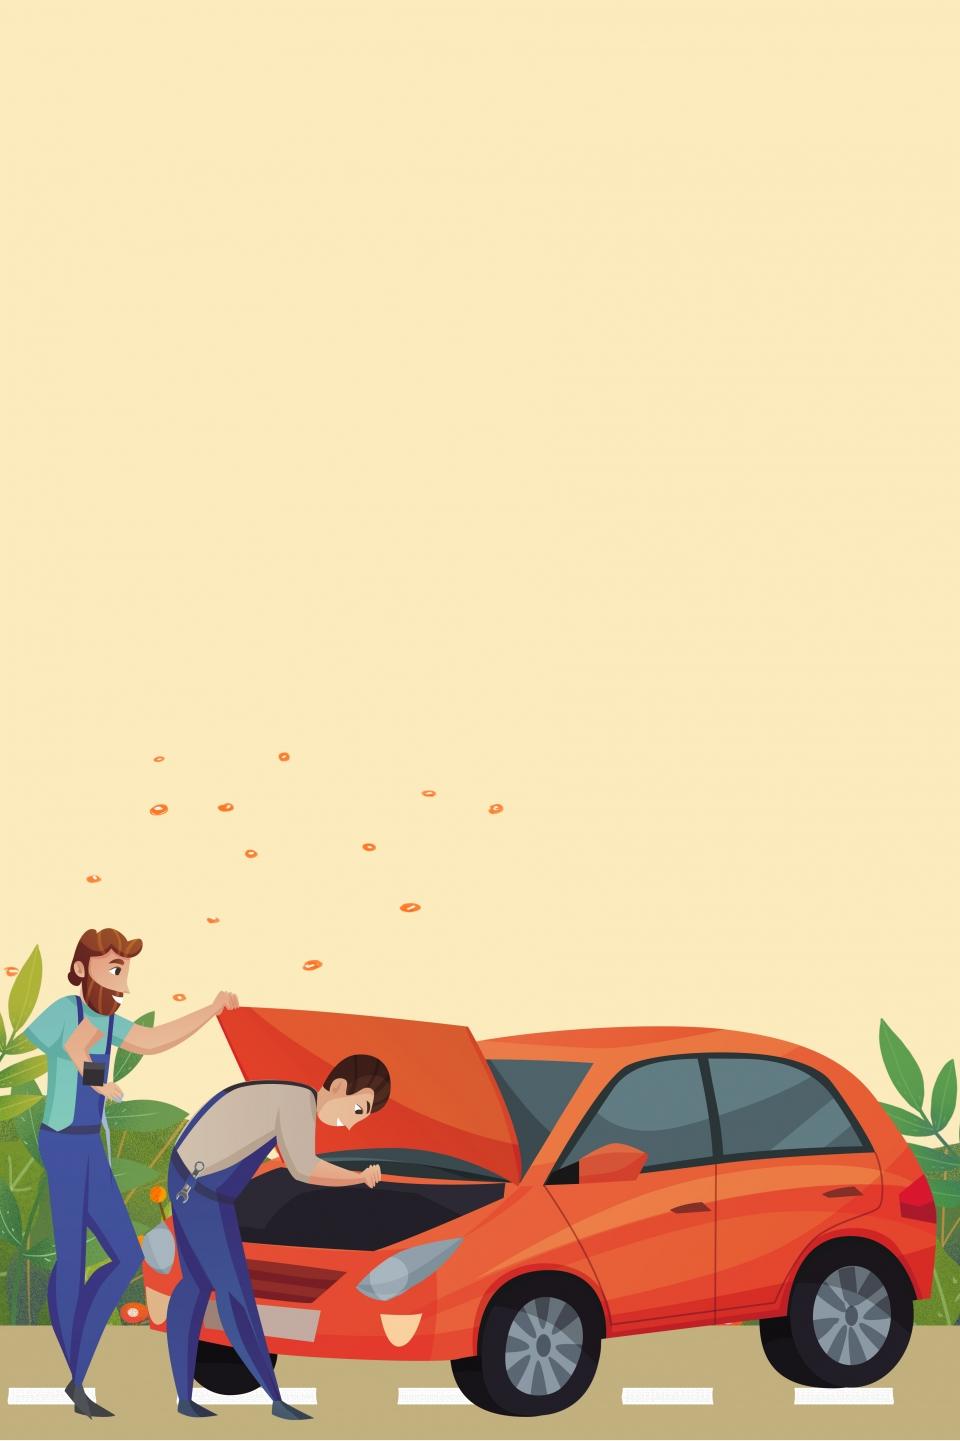 Car Repair And Maintenance >> Yellow Cartoon Vector Car Repair Beauty Background Material